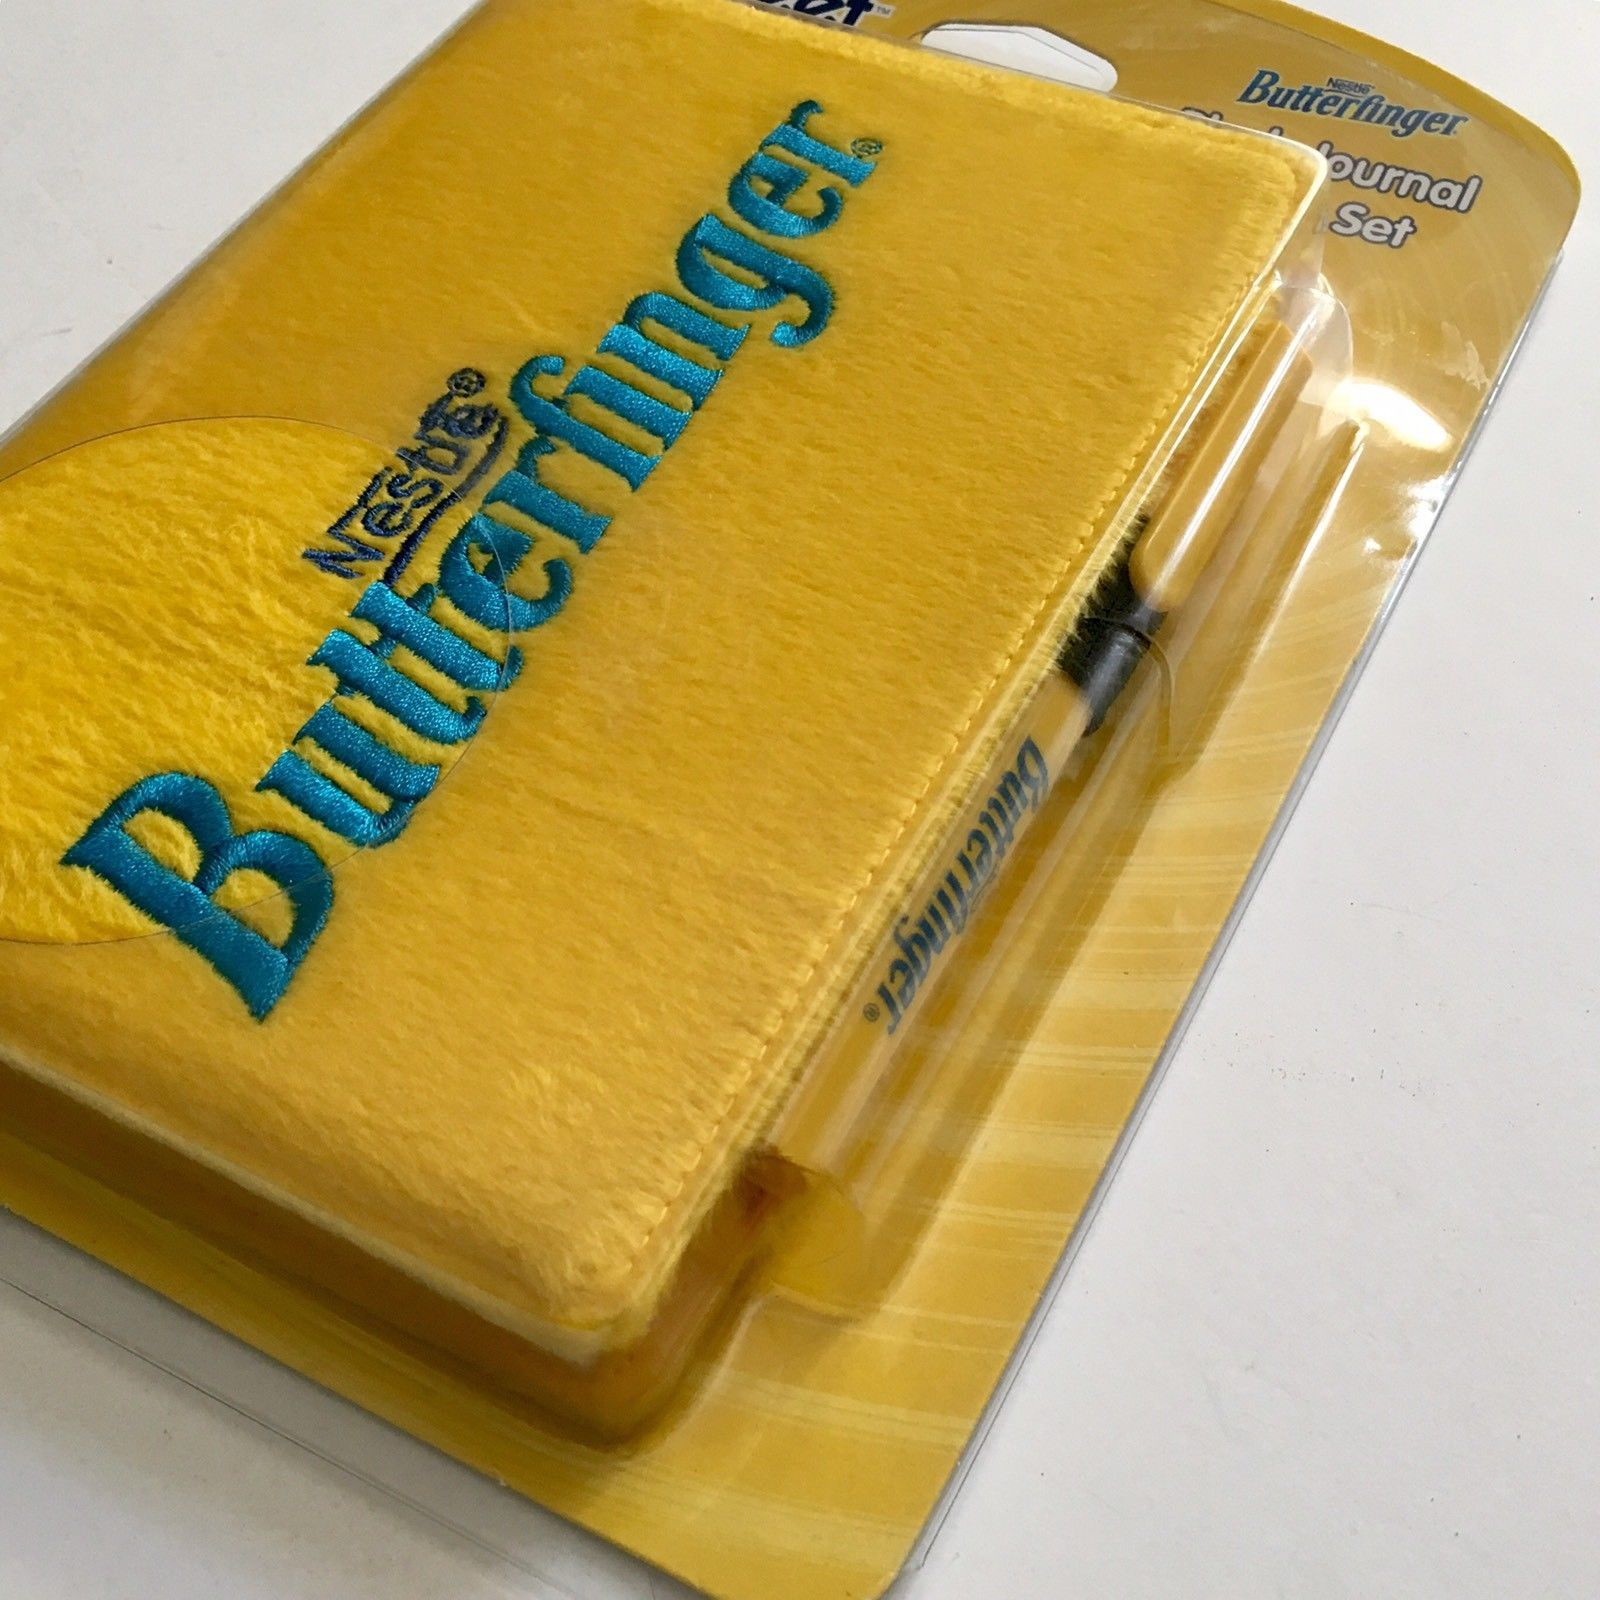 Butterfinger Candy Bar Plush Journal Pen Set Nestle Yellow Sweet Thing Thang NIP